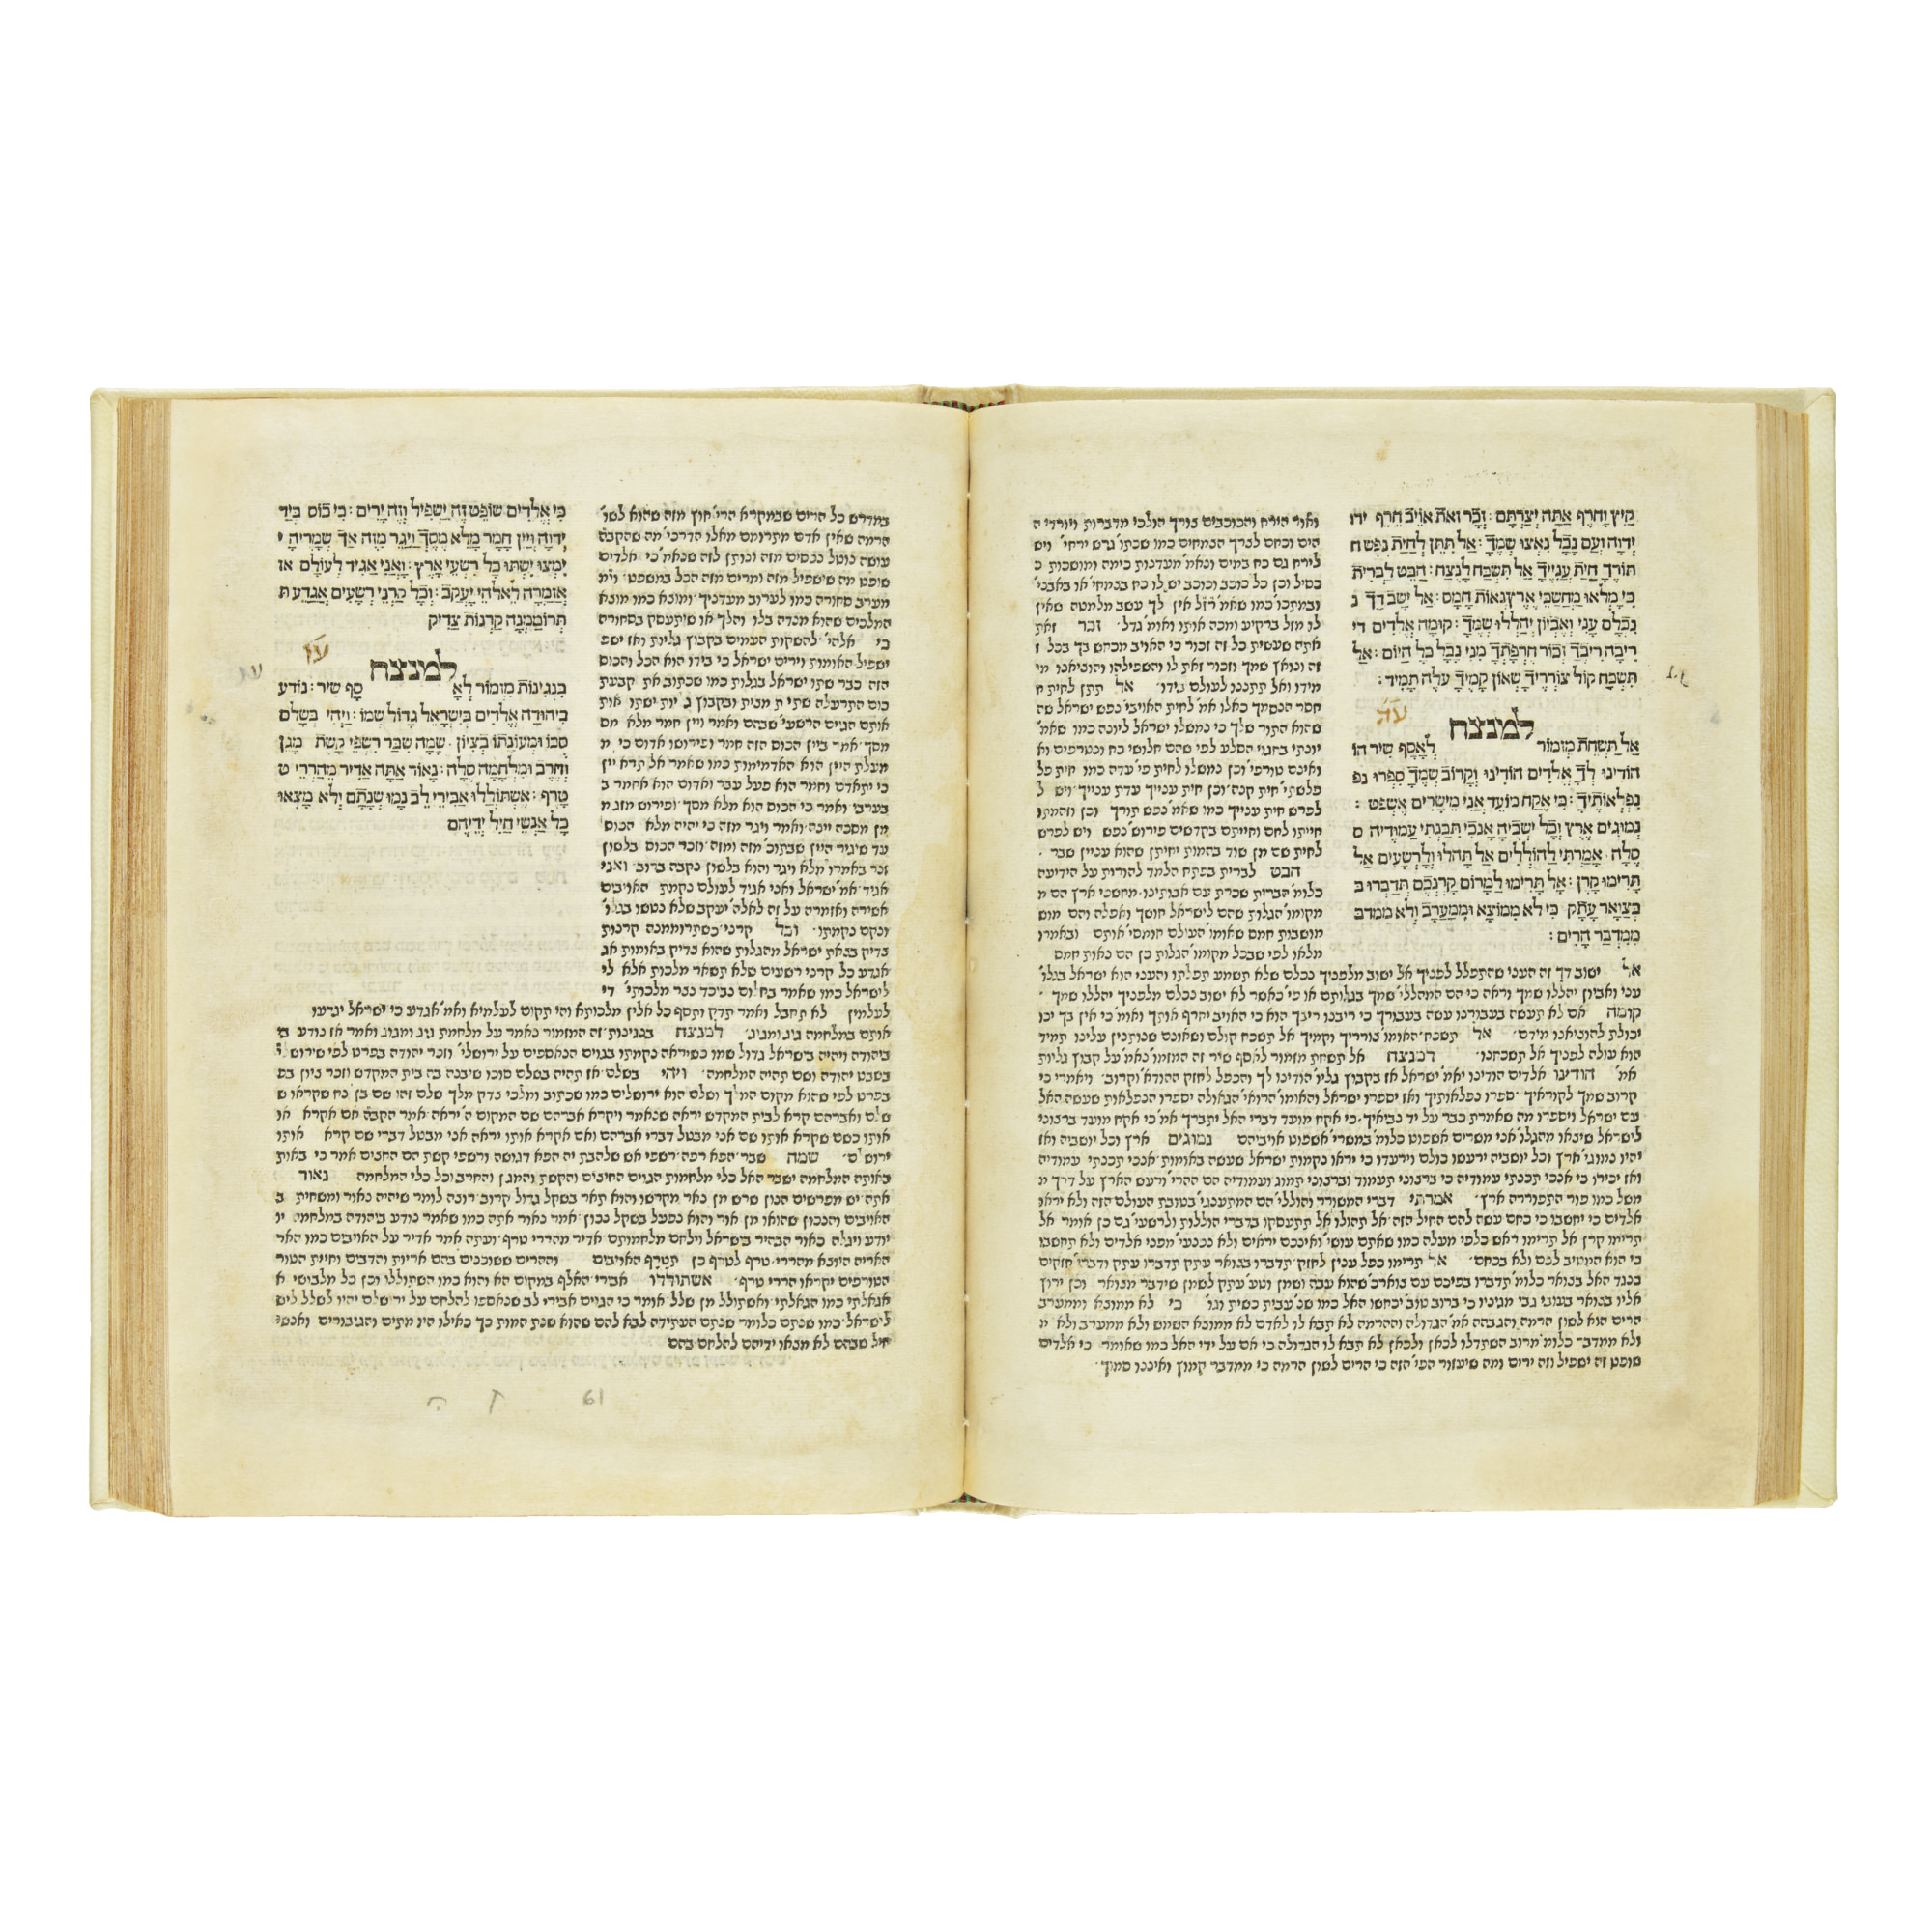 PSALMS WITH THE COMMENTARY OF RABBI DAVID KIMHI, EDITED BY RABBI JACOB LANDAU, NAPLES: JOSEPH BEN JACOB ASHKENAZI [GUNZENHAUSER], 1487